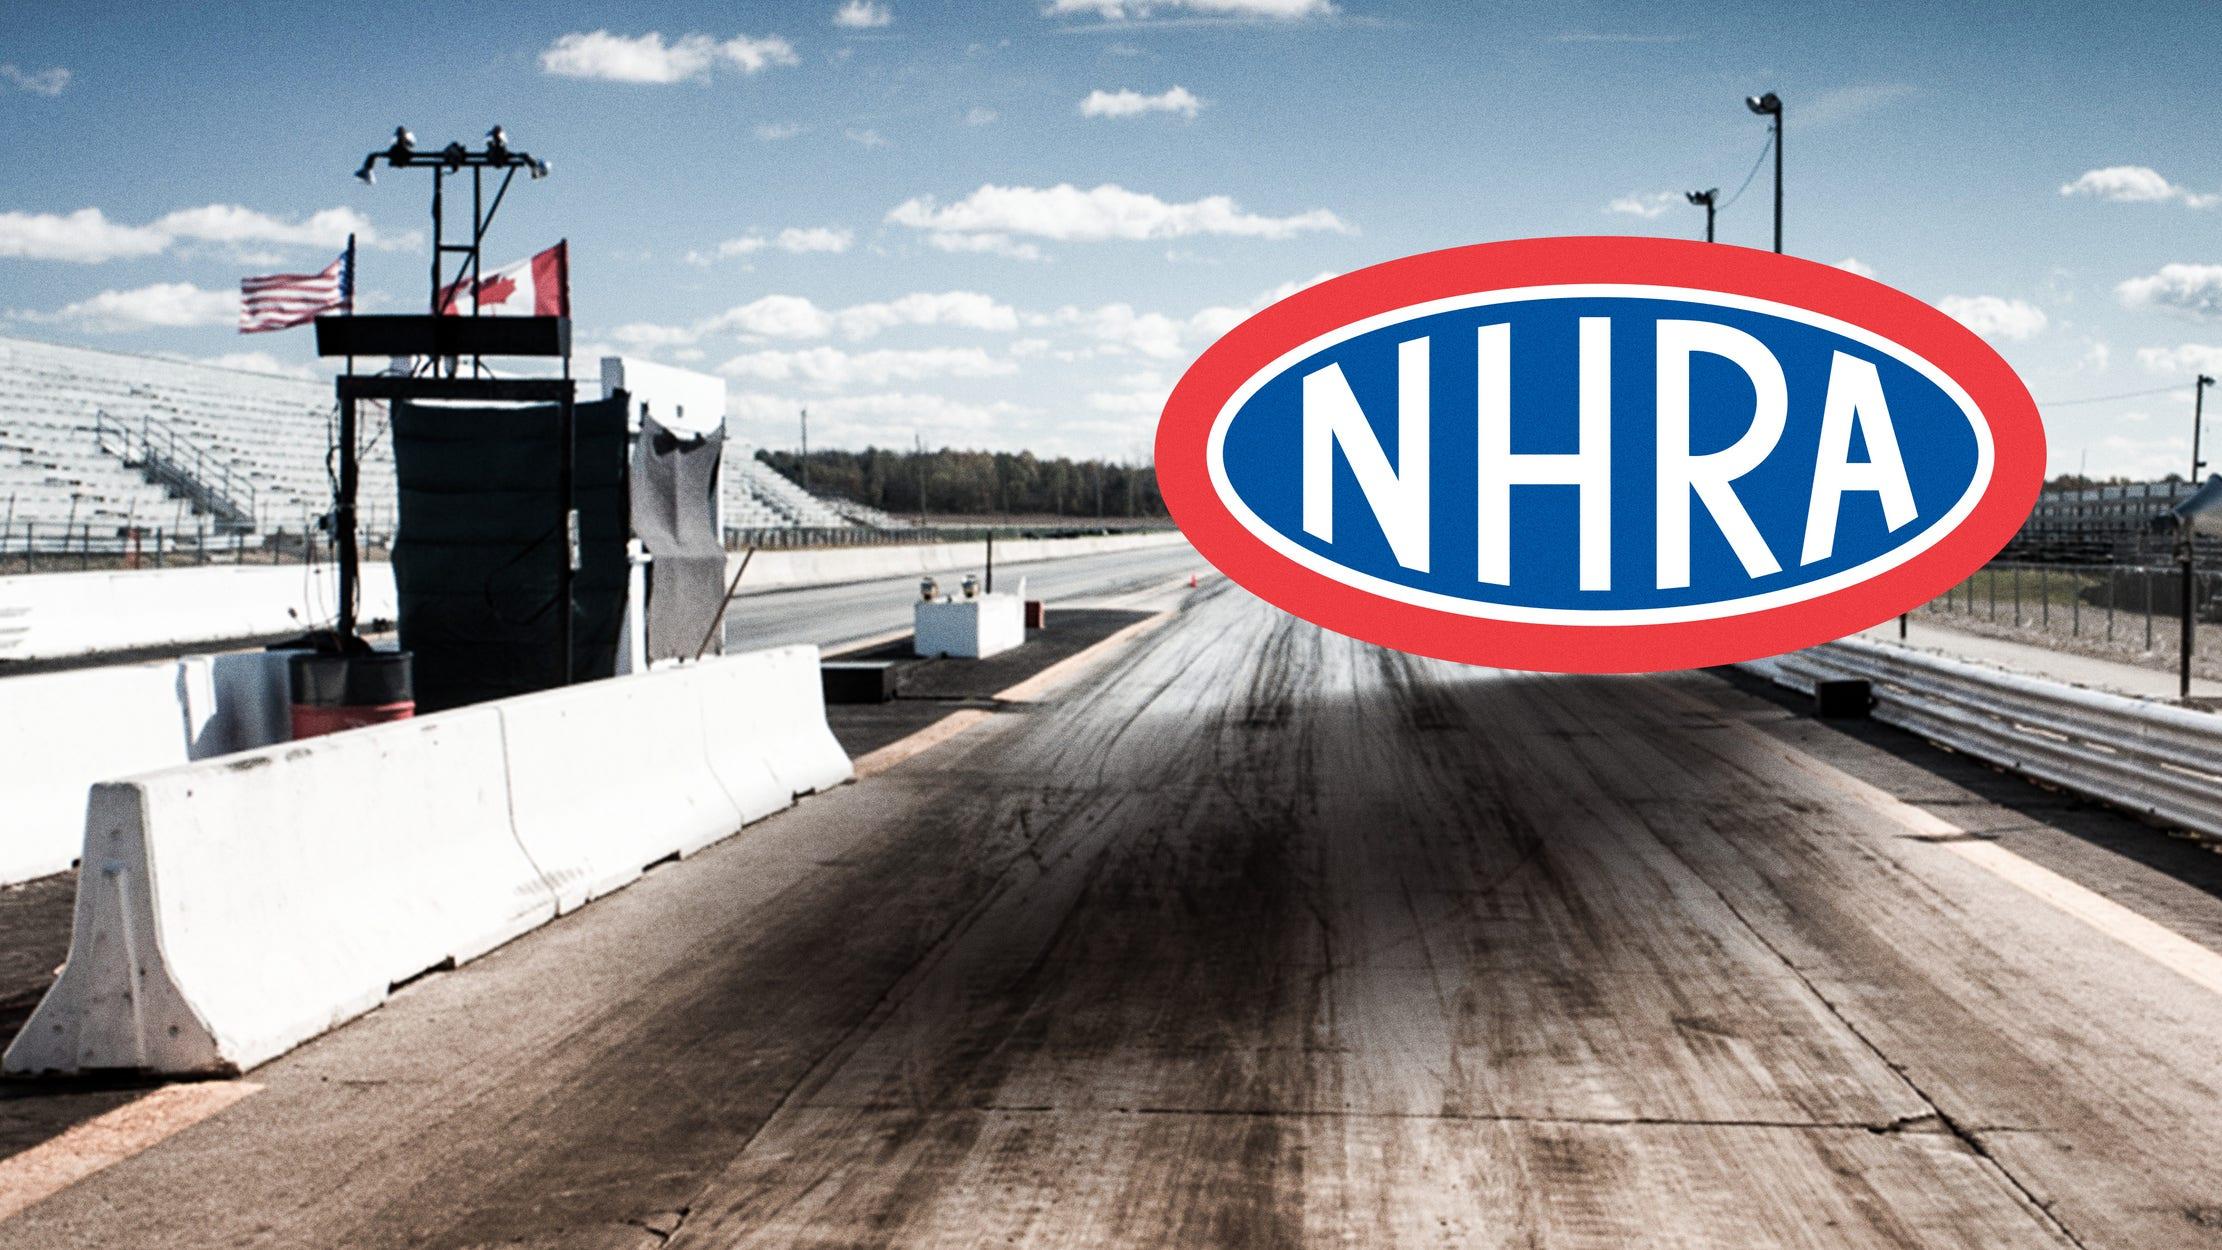 NHRA Drag Racing - NHRA Midwest Nationals seriesDetail